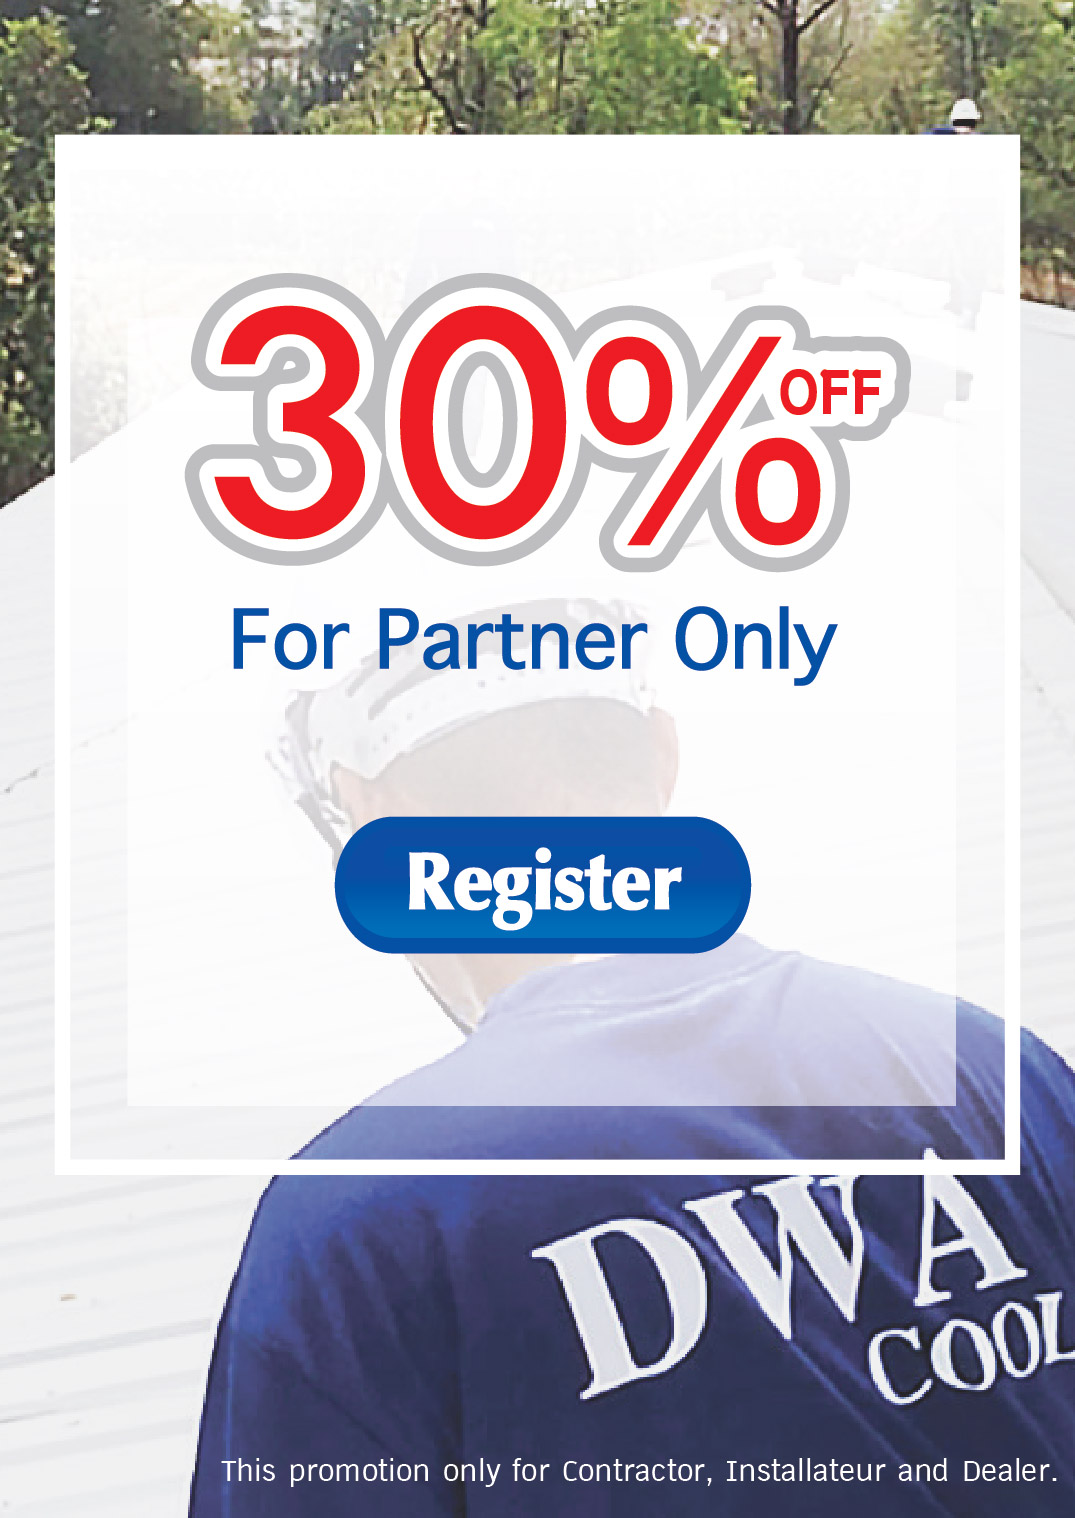 30% off For Partner Only